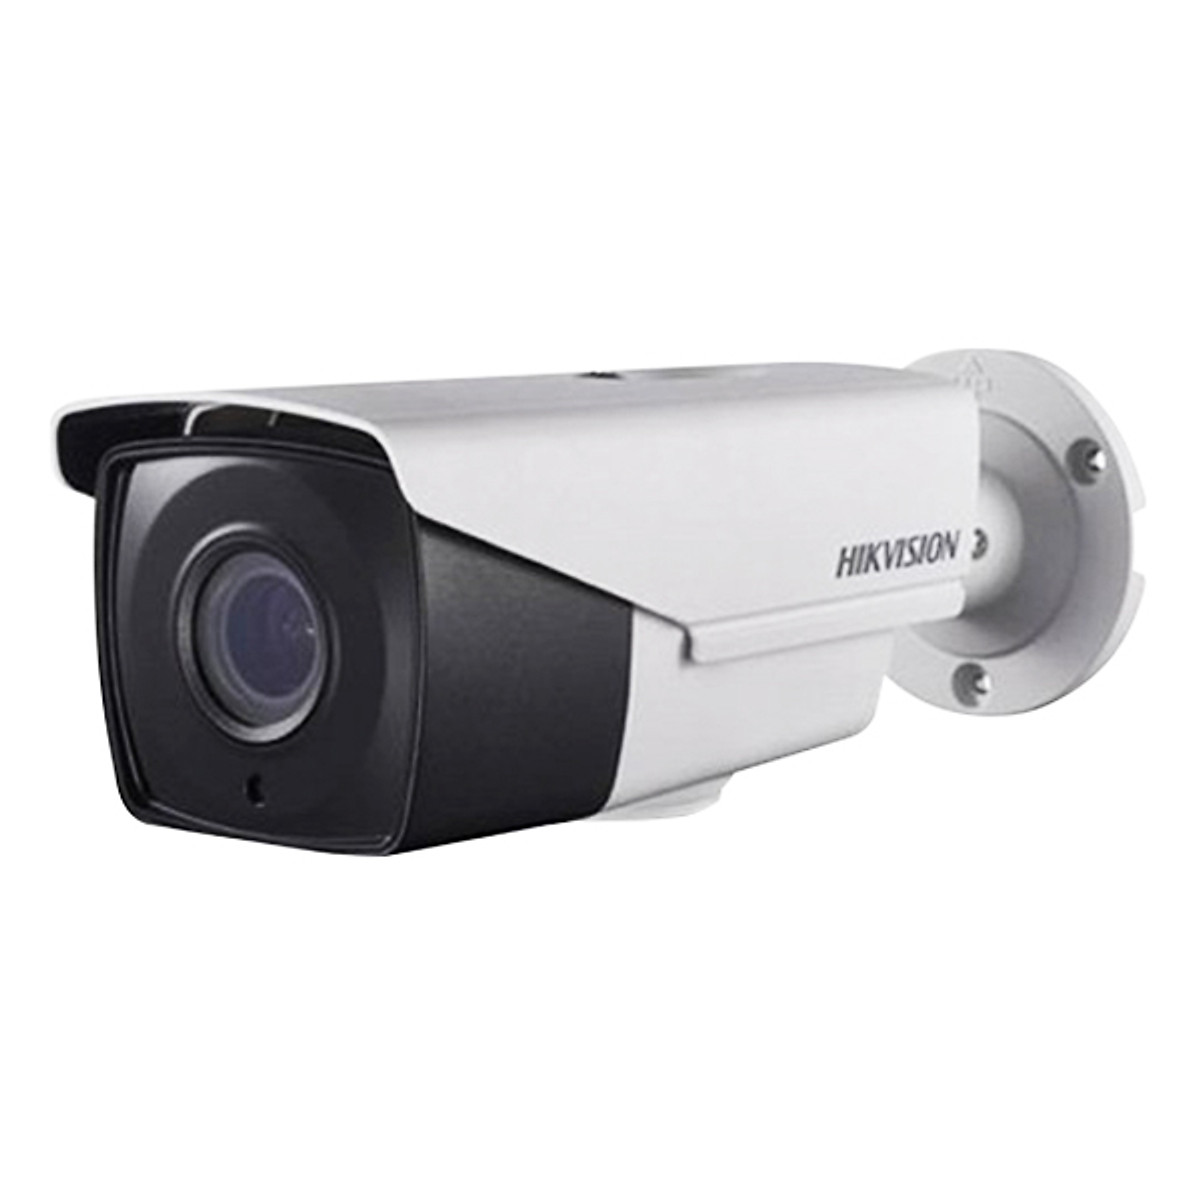 Camera HIKVISION DS-2CE16F7T-IT3Z 3.0 Megapixel – Hàng Nhập Khẩu